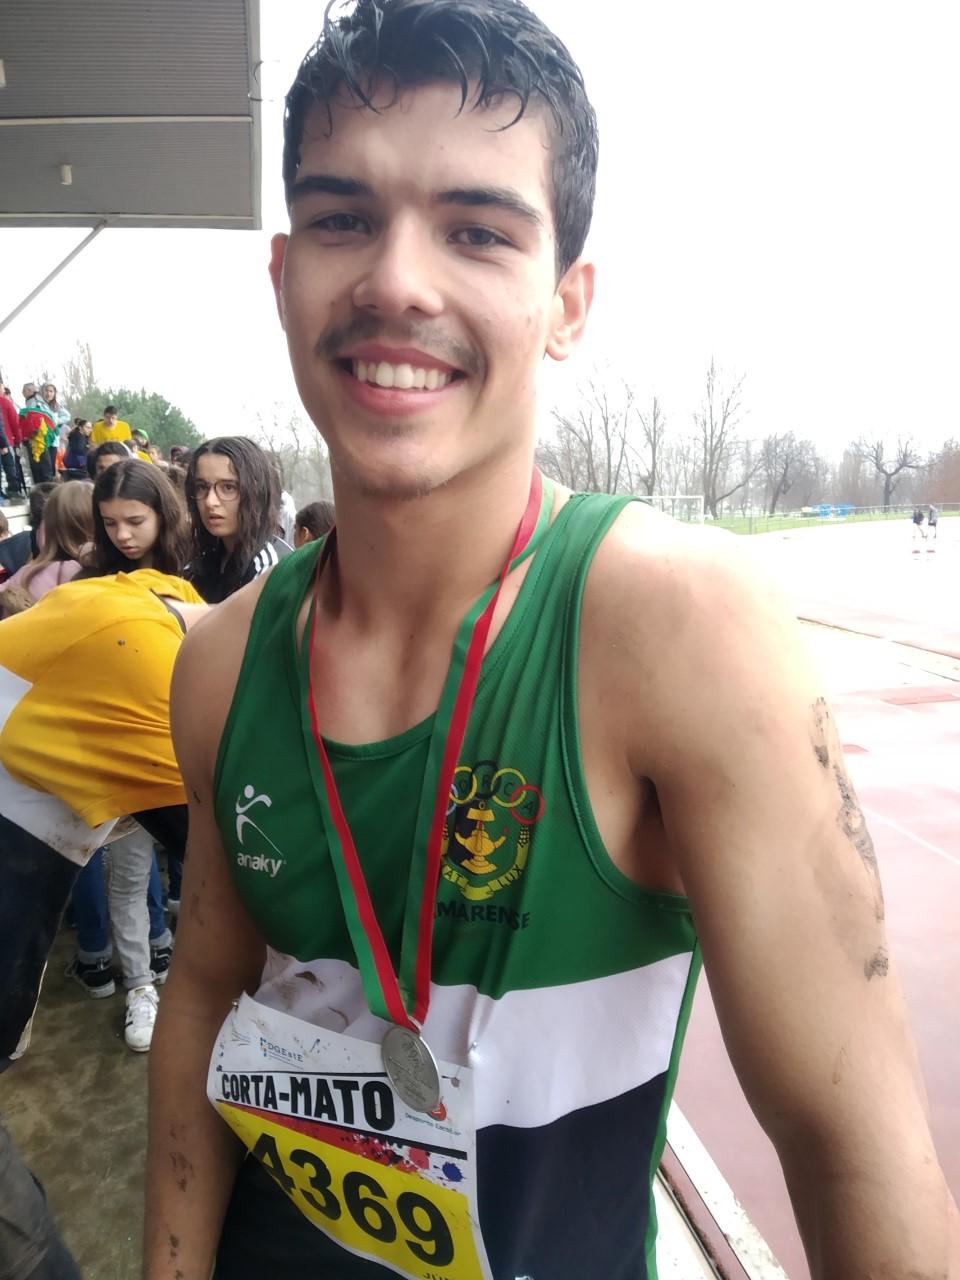 CORTA-MATO ESCOLAR: André Silva (da EPATV) vice-campeão distrital júnior